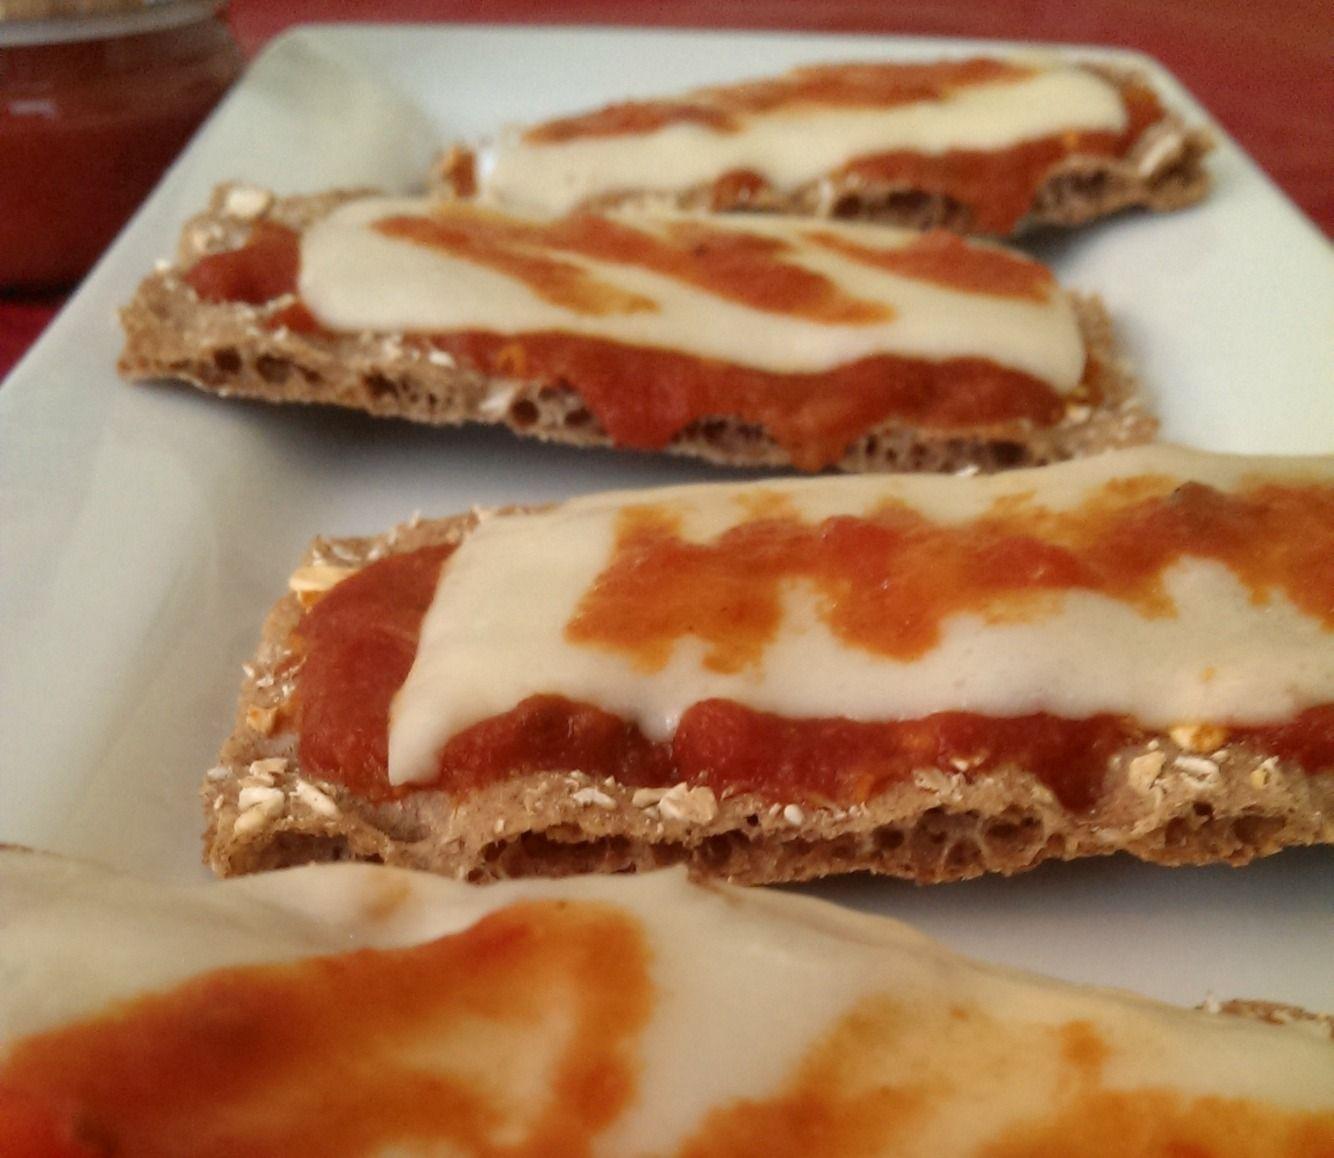 Easy After School Snacks - Wasa® Crispbread Pizzas - Easy After School Snacks Wasa® Crispbread Pizzas #coupons #BarillaPlus #BarillaGlutenFree @walmart @BarillaUS #ad